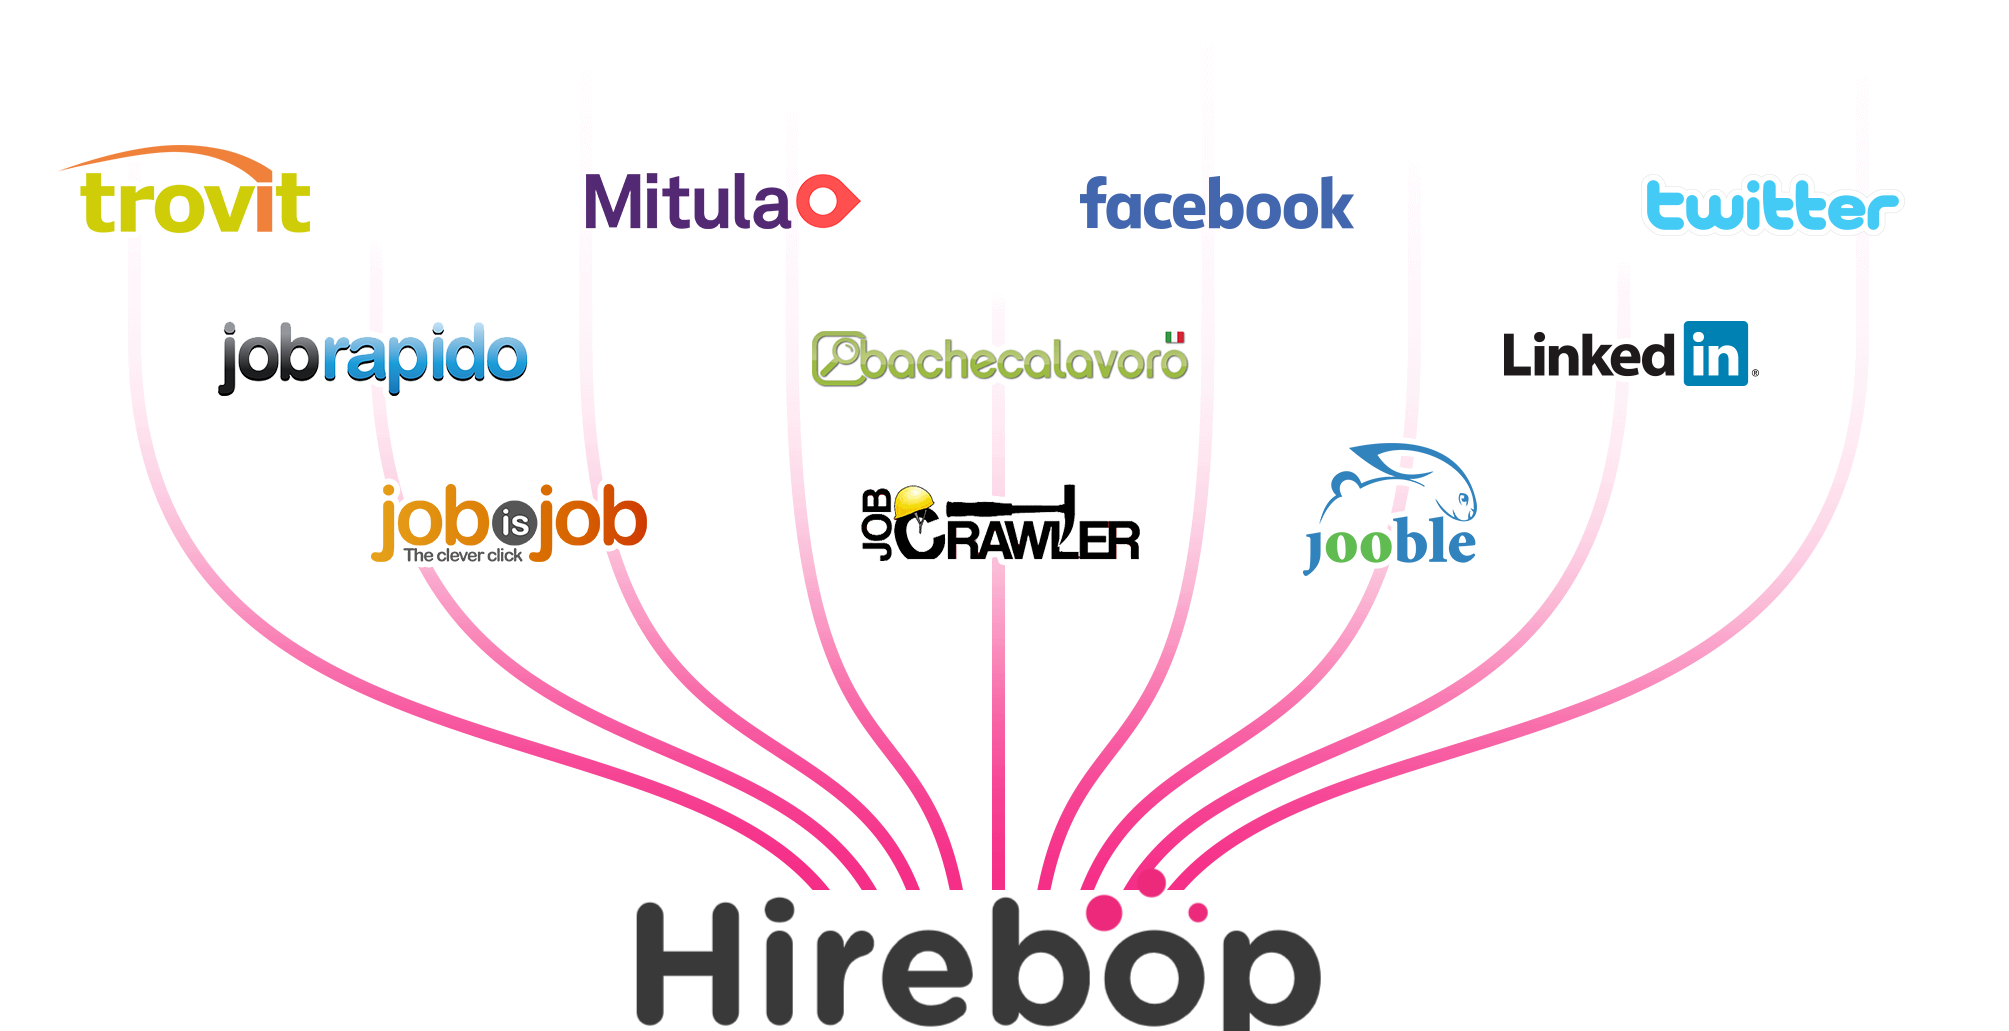 multiposting Hirebop